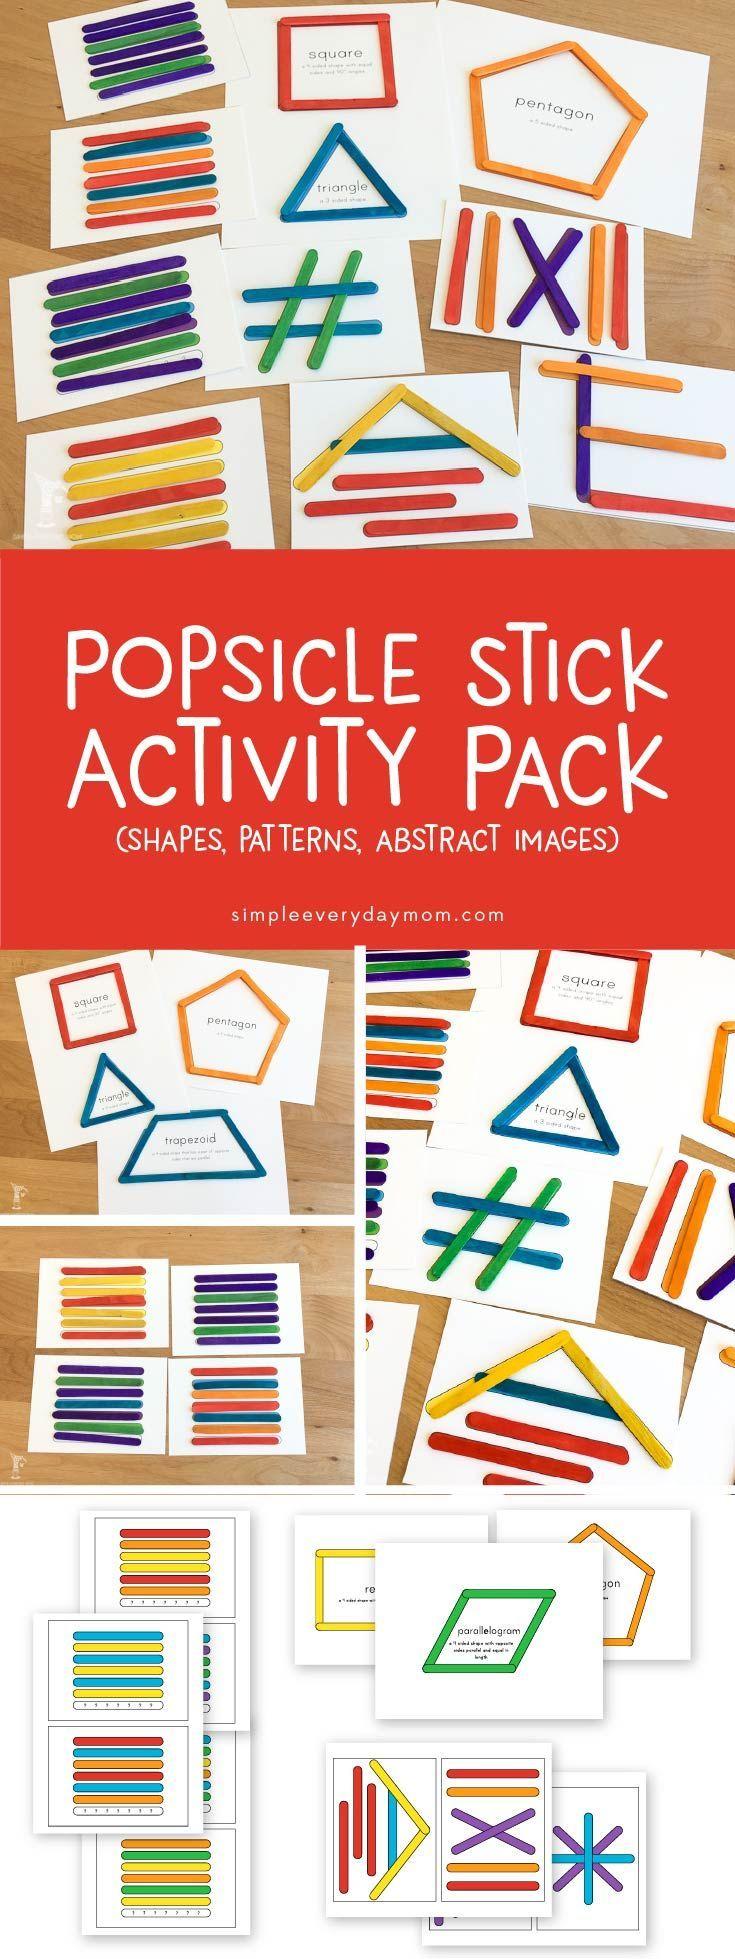 Easy Prep Popsicle Stick Projekte für kleine Kinder #popciclesticks